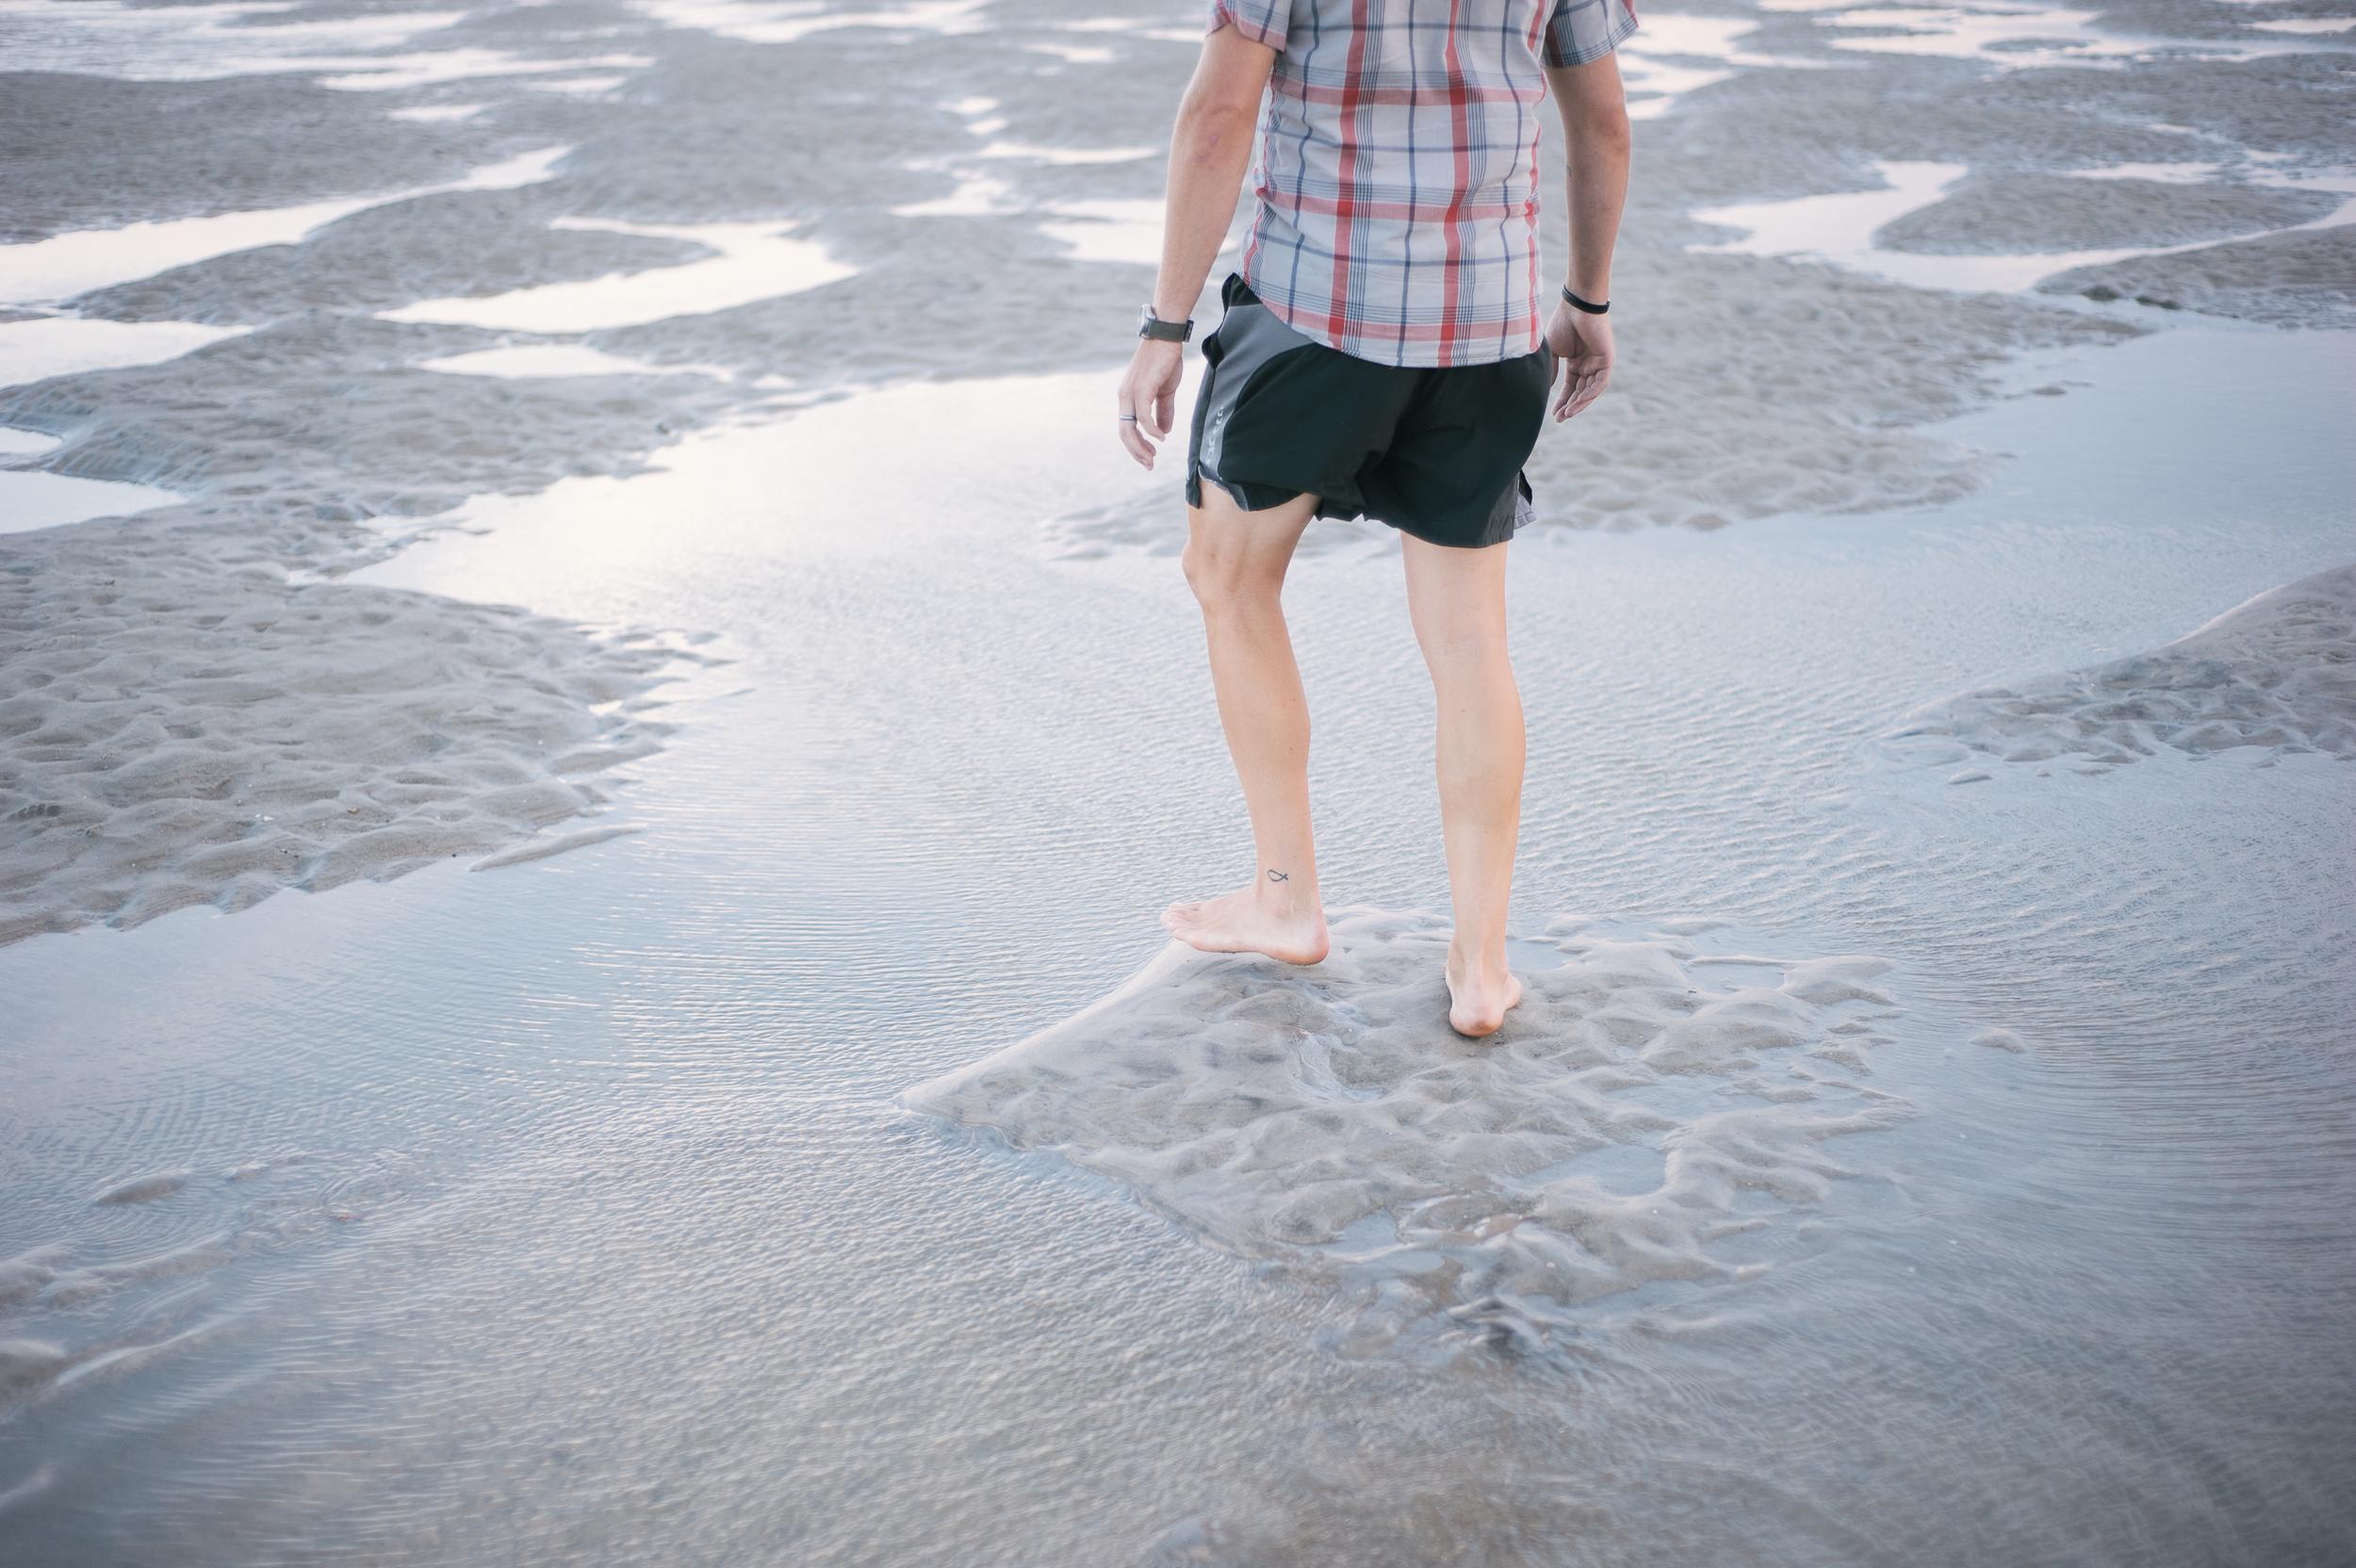 m.newsom-photography-savannah-wedding-photographer-tybee-island-photographer-kami-and-petra-july-2015 (30 of 230).jpg